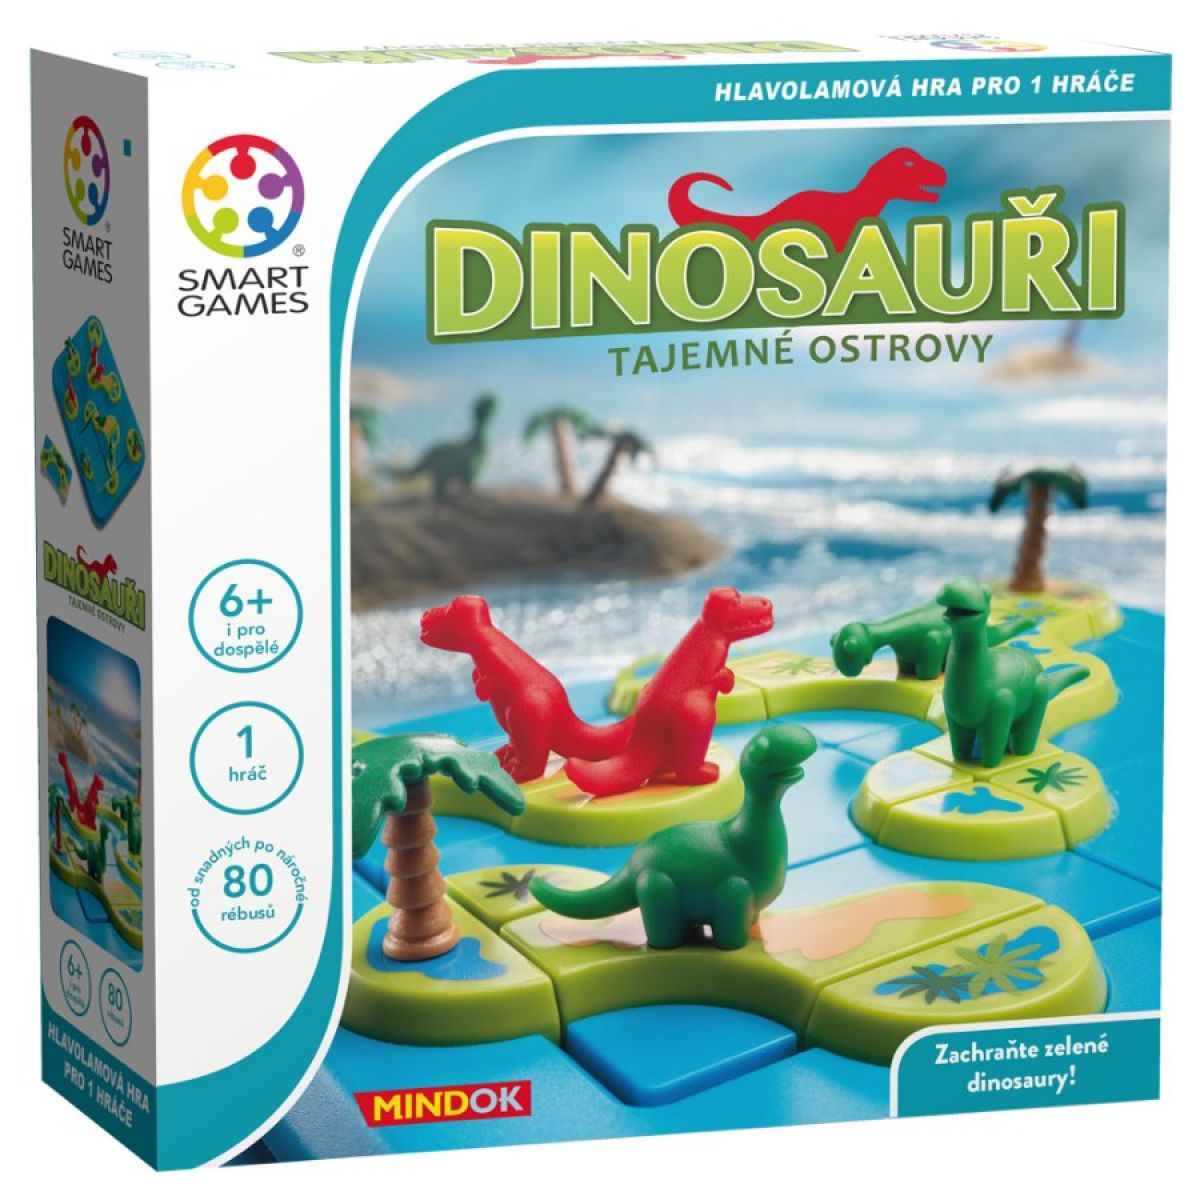 Smart Games Dinosauři Tajemné ostrovy